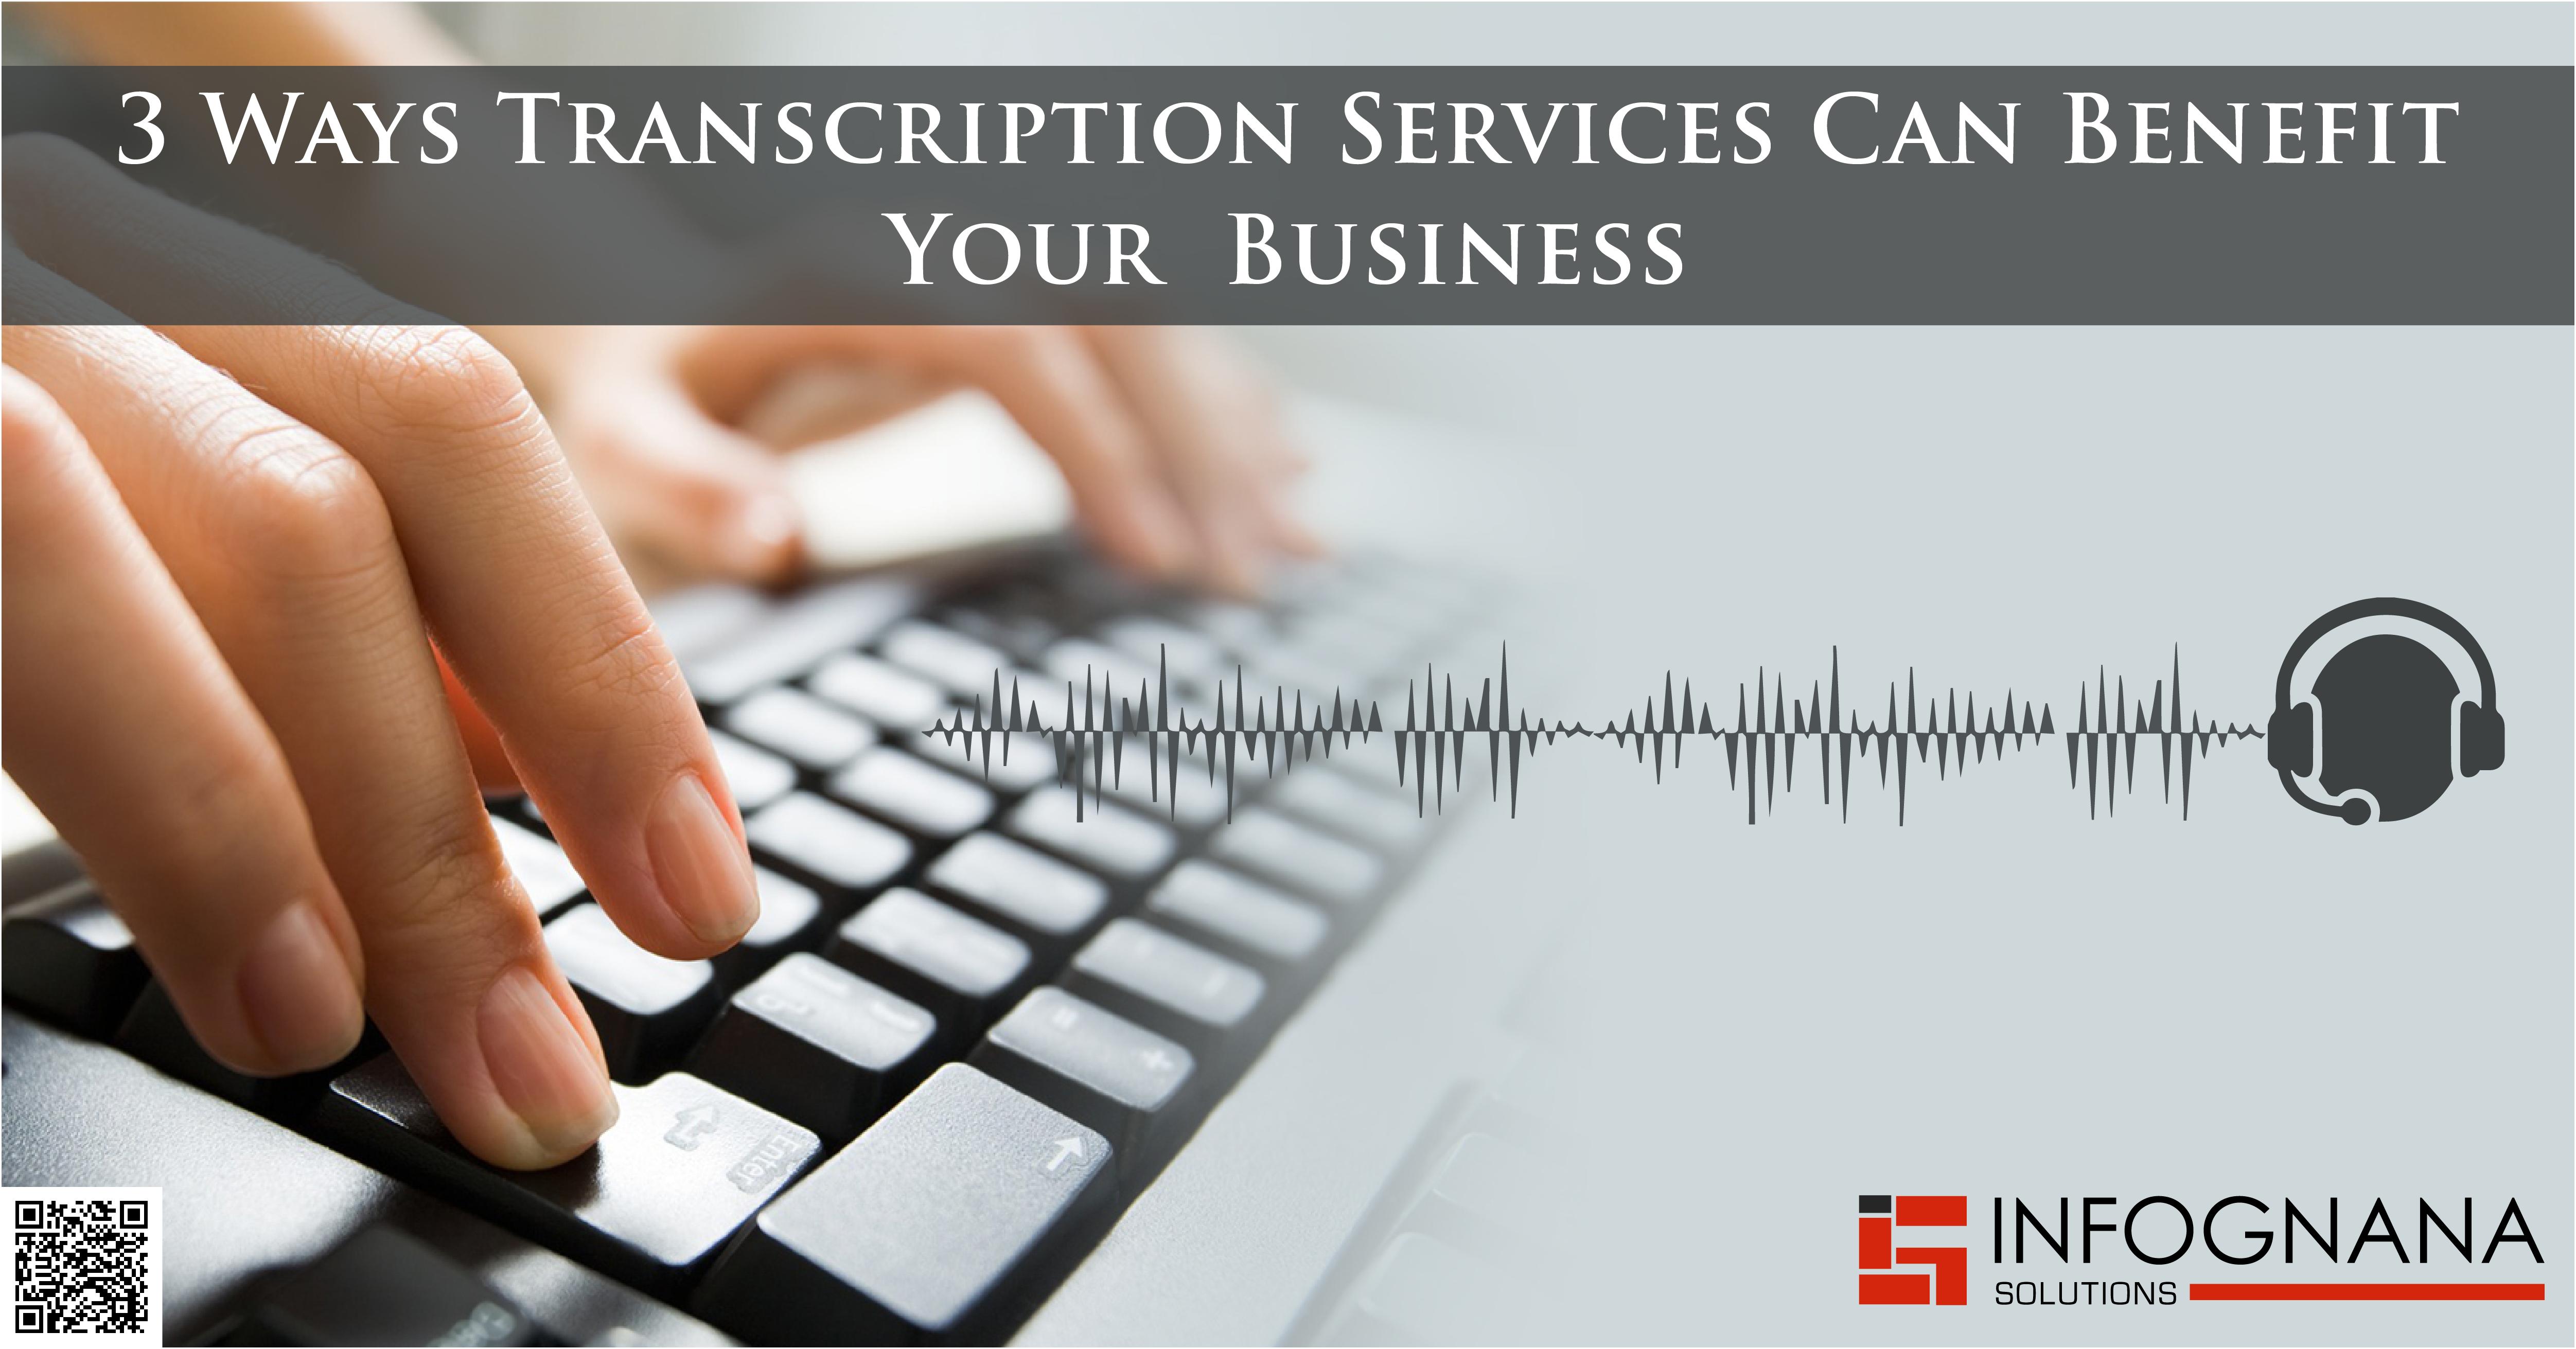 3 Ways Transcription Services Can Benefit Your Business